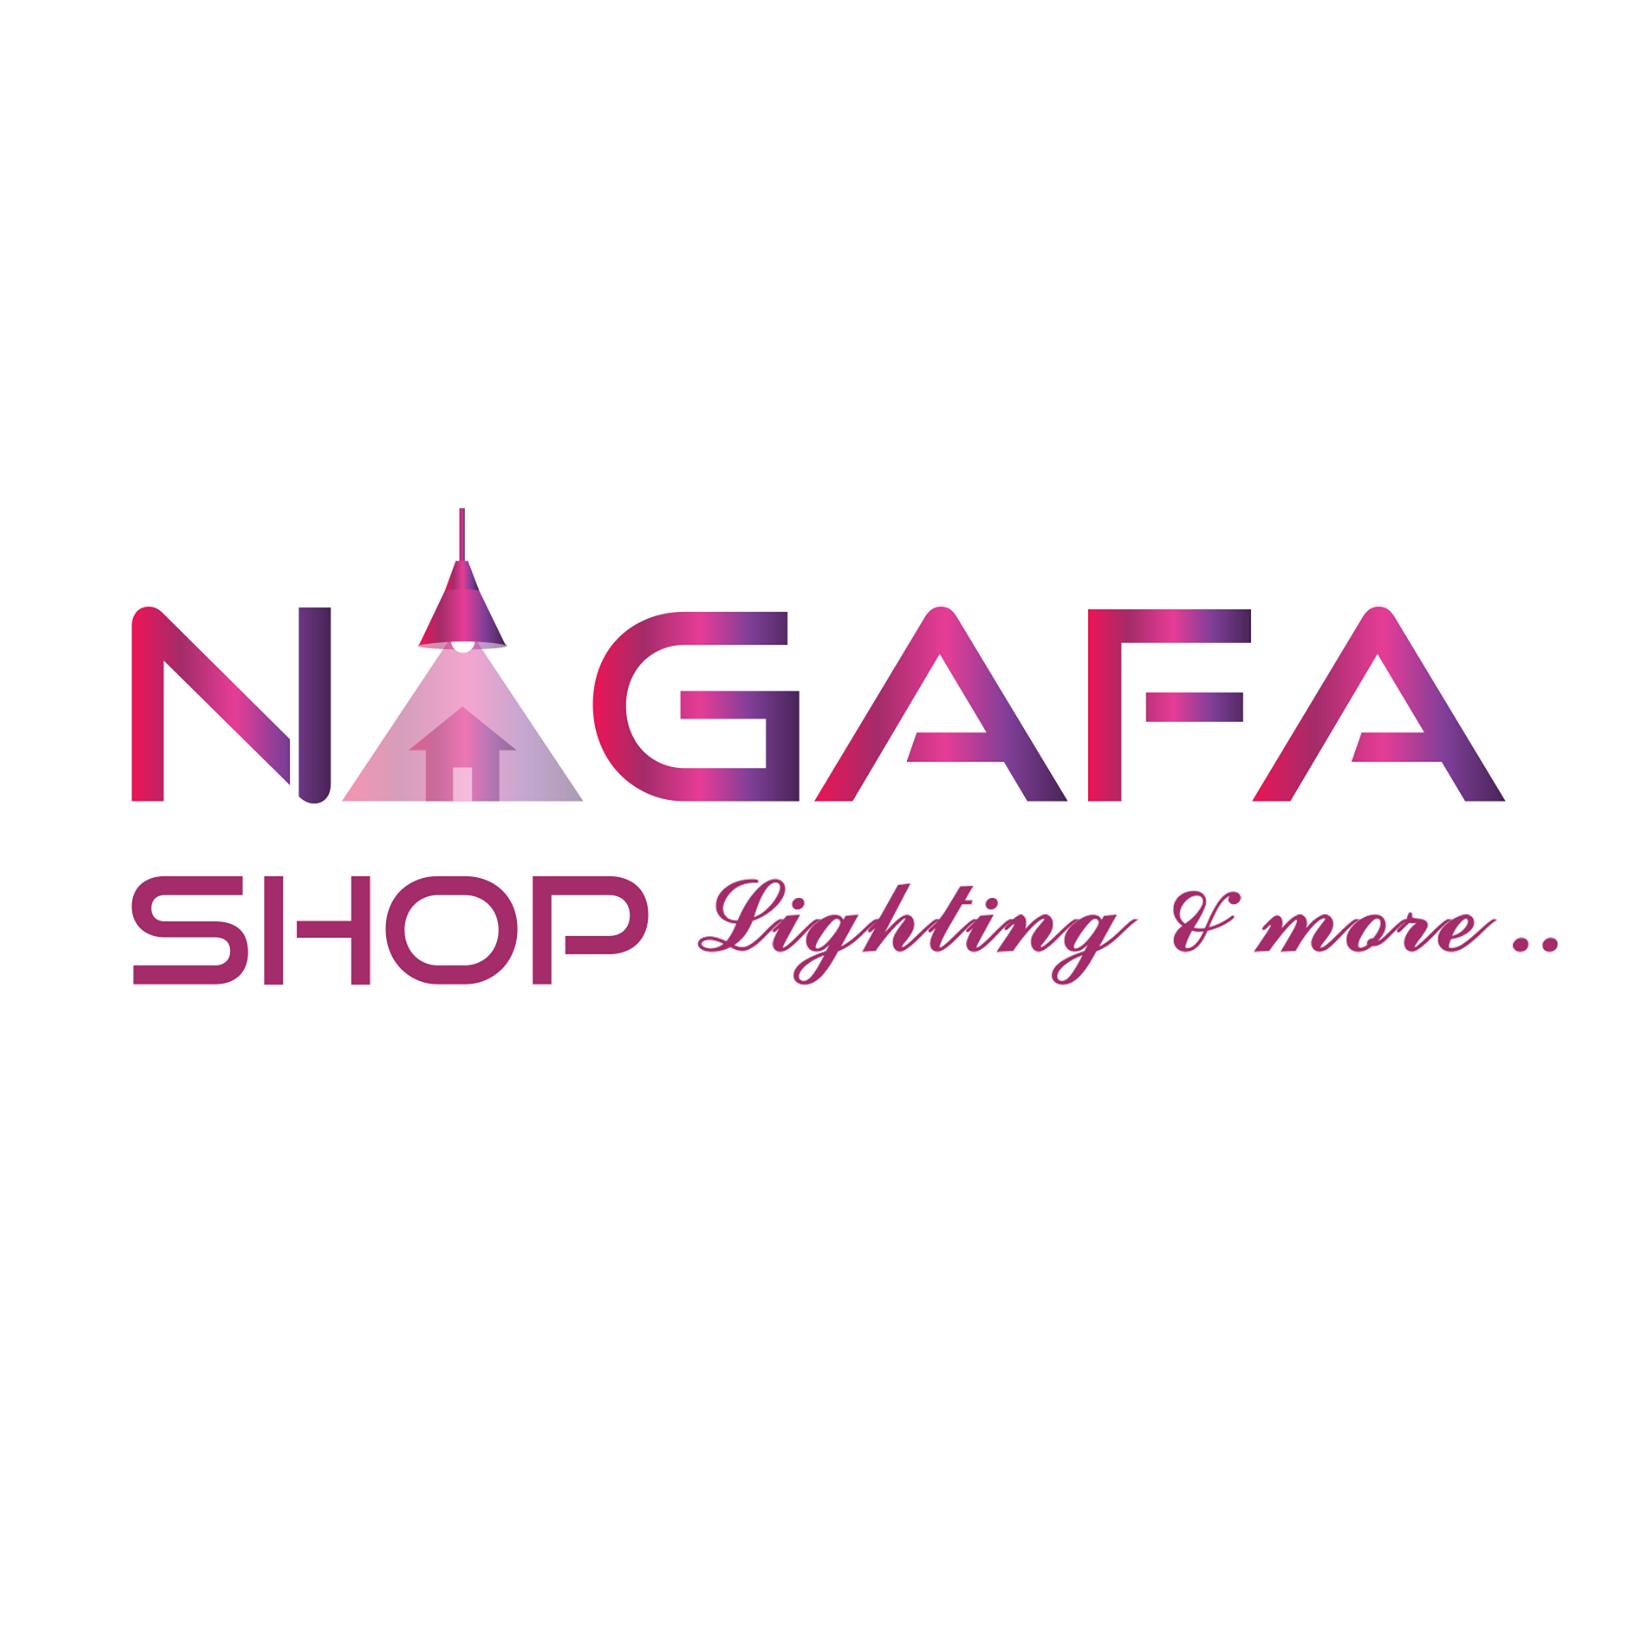 نجفة شوب Nagafa Shop